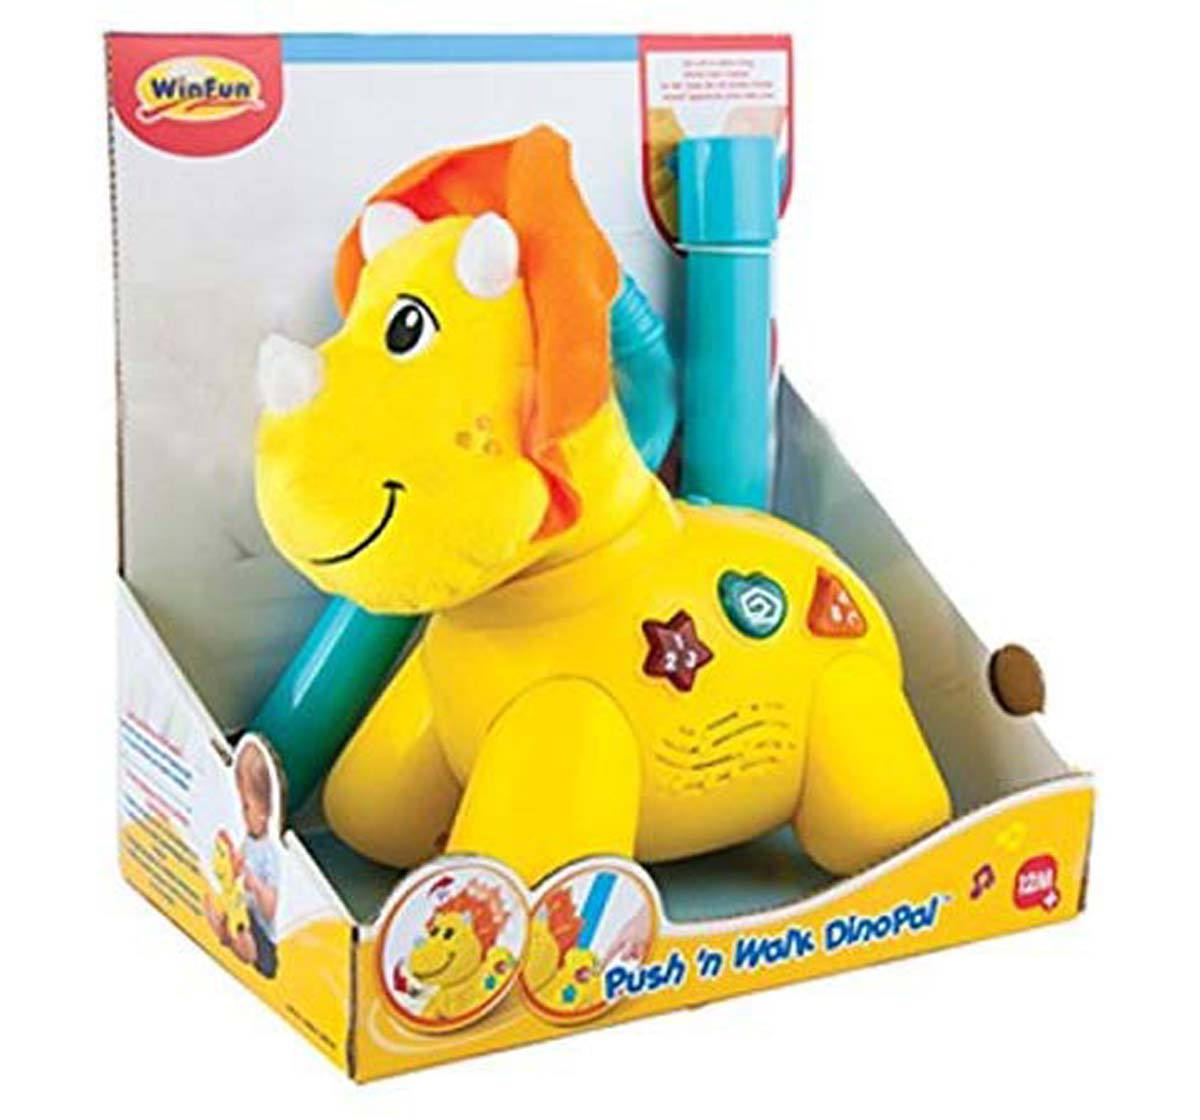 WinFun | Winfun Push N Walk Dino Pal - Yellow Early Learner Toys for Kids age 12M+